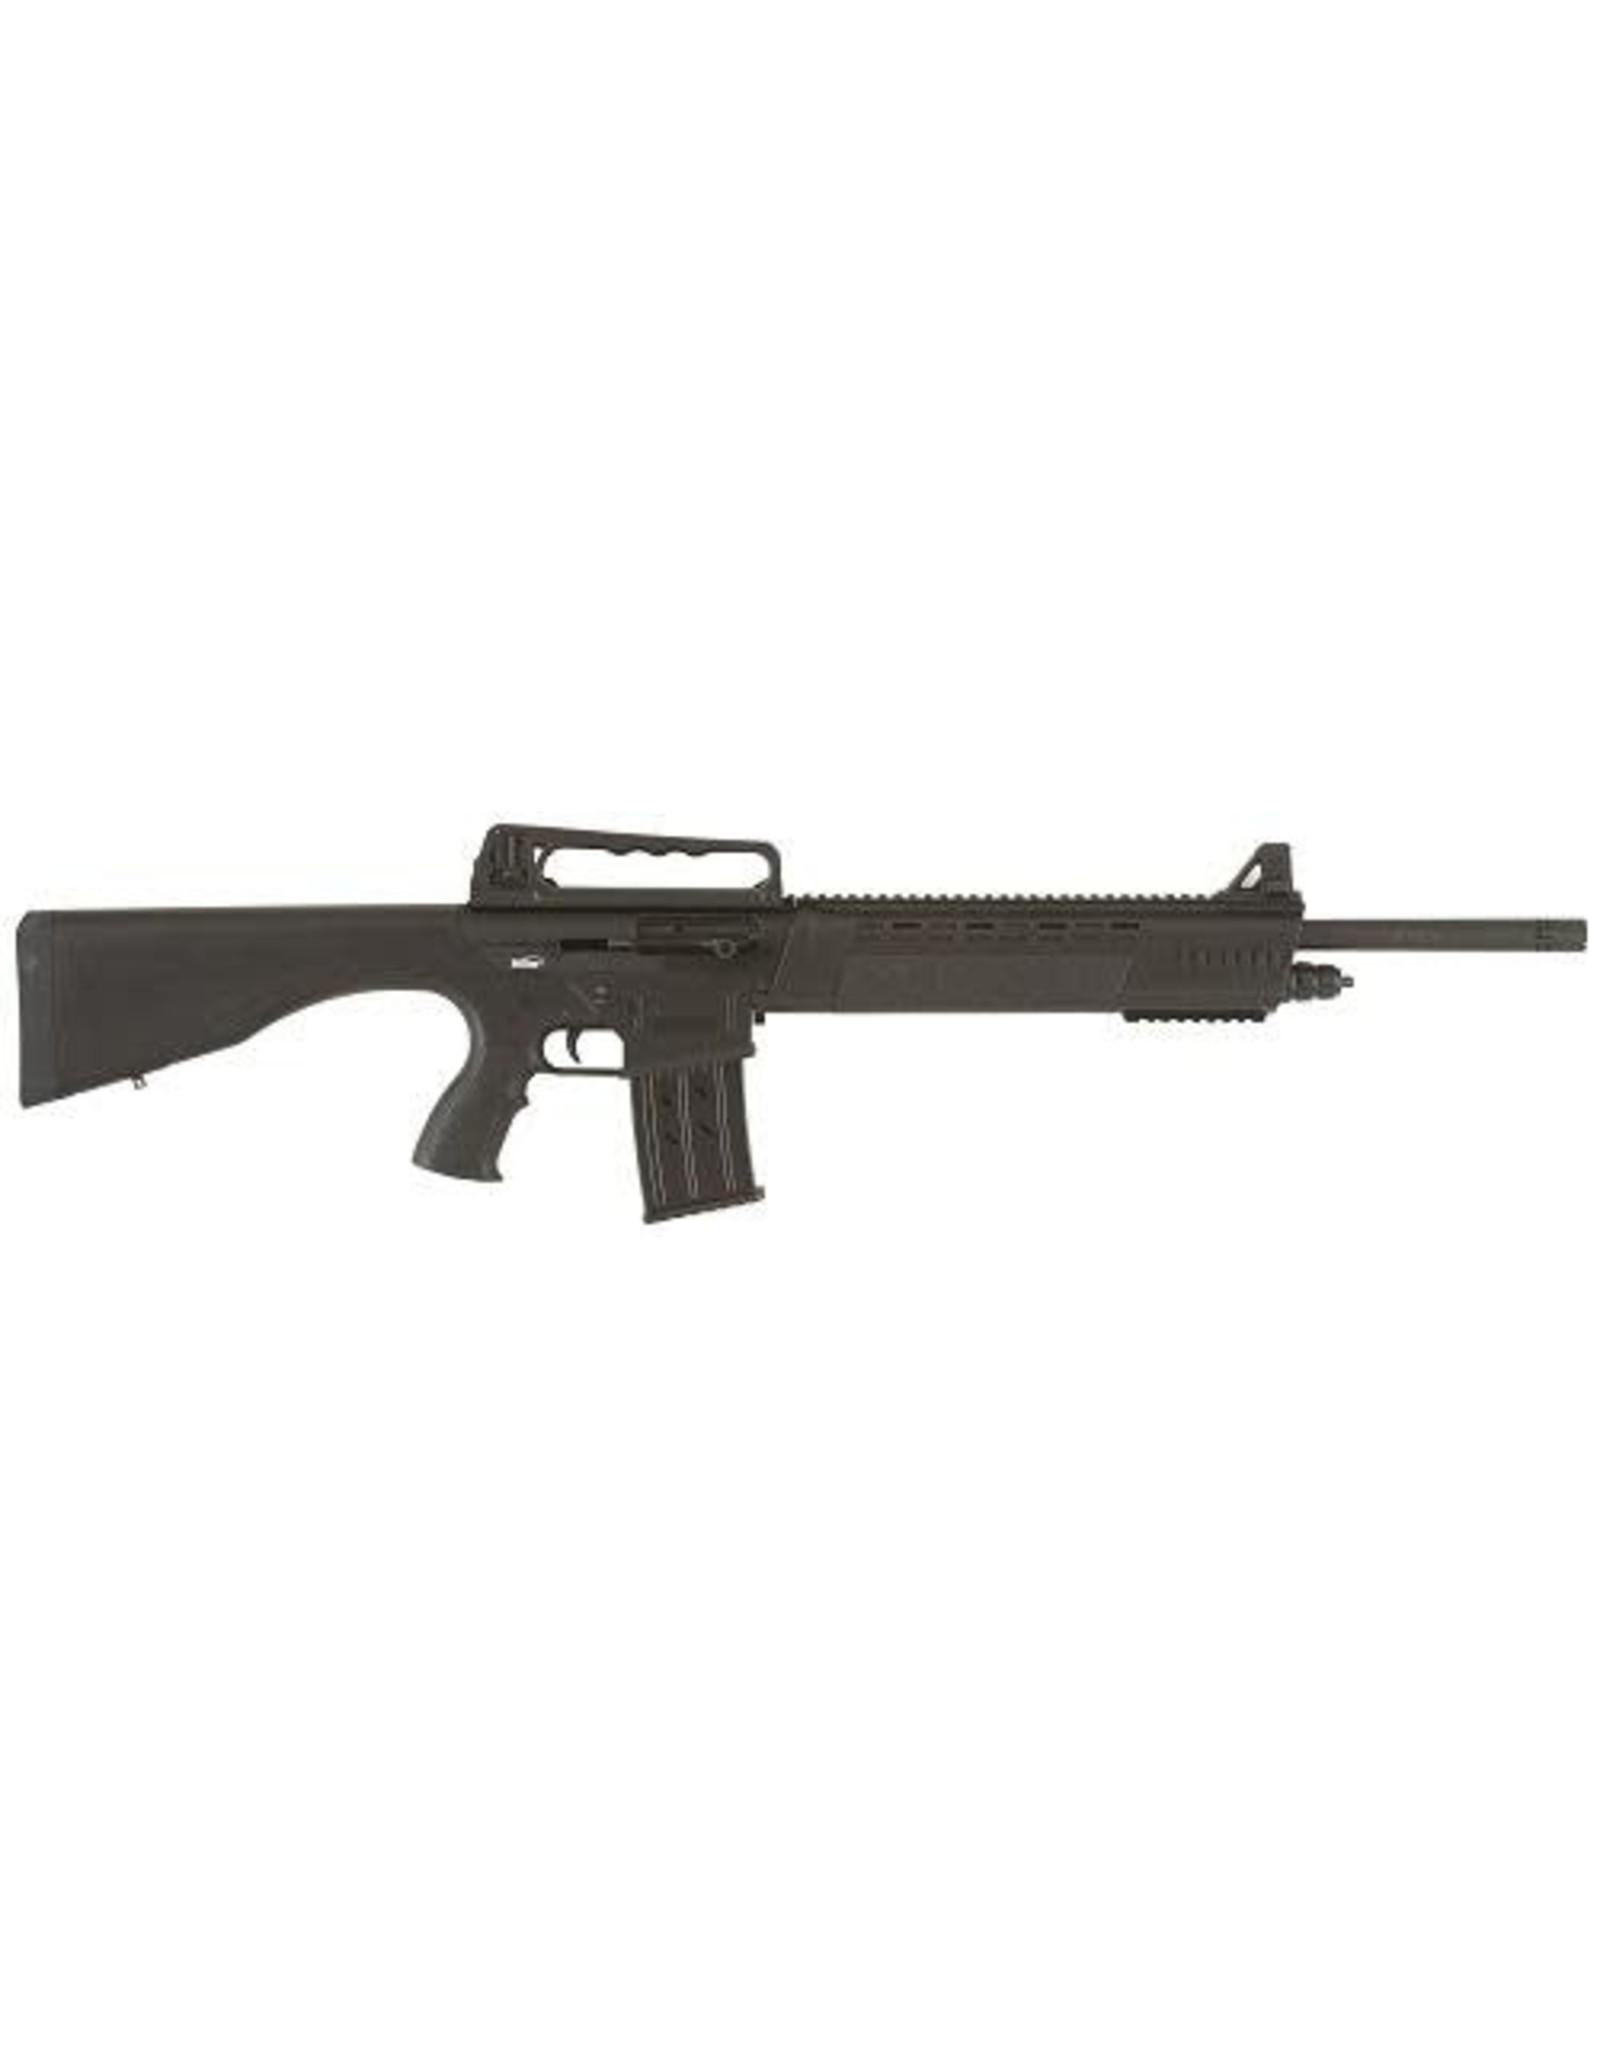 "Tristar KRX TACTICAL - 12ga - 3"" Chamber 20"" Barrel w/Pistol Grip"